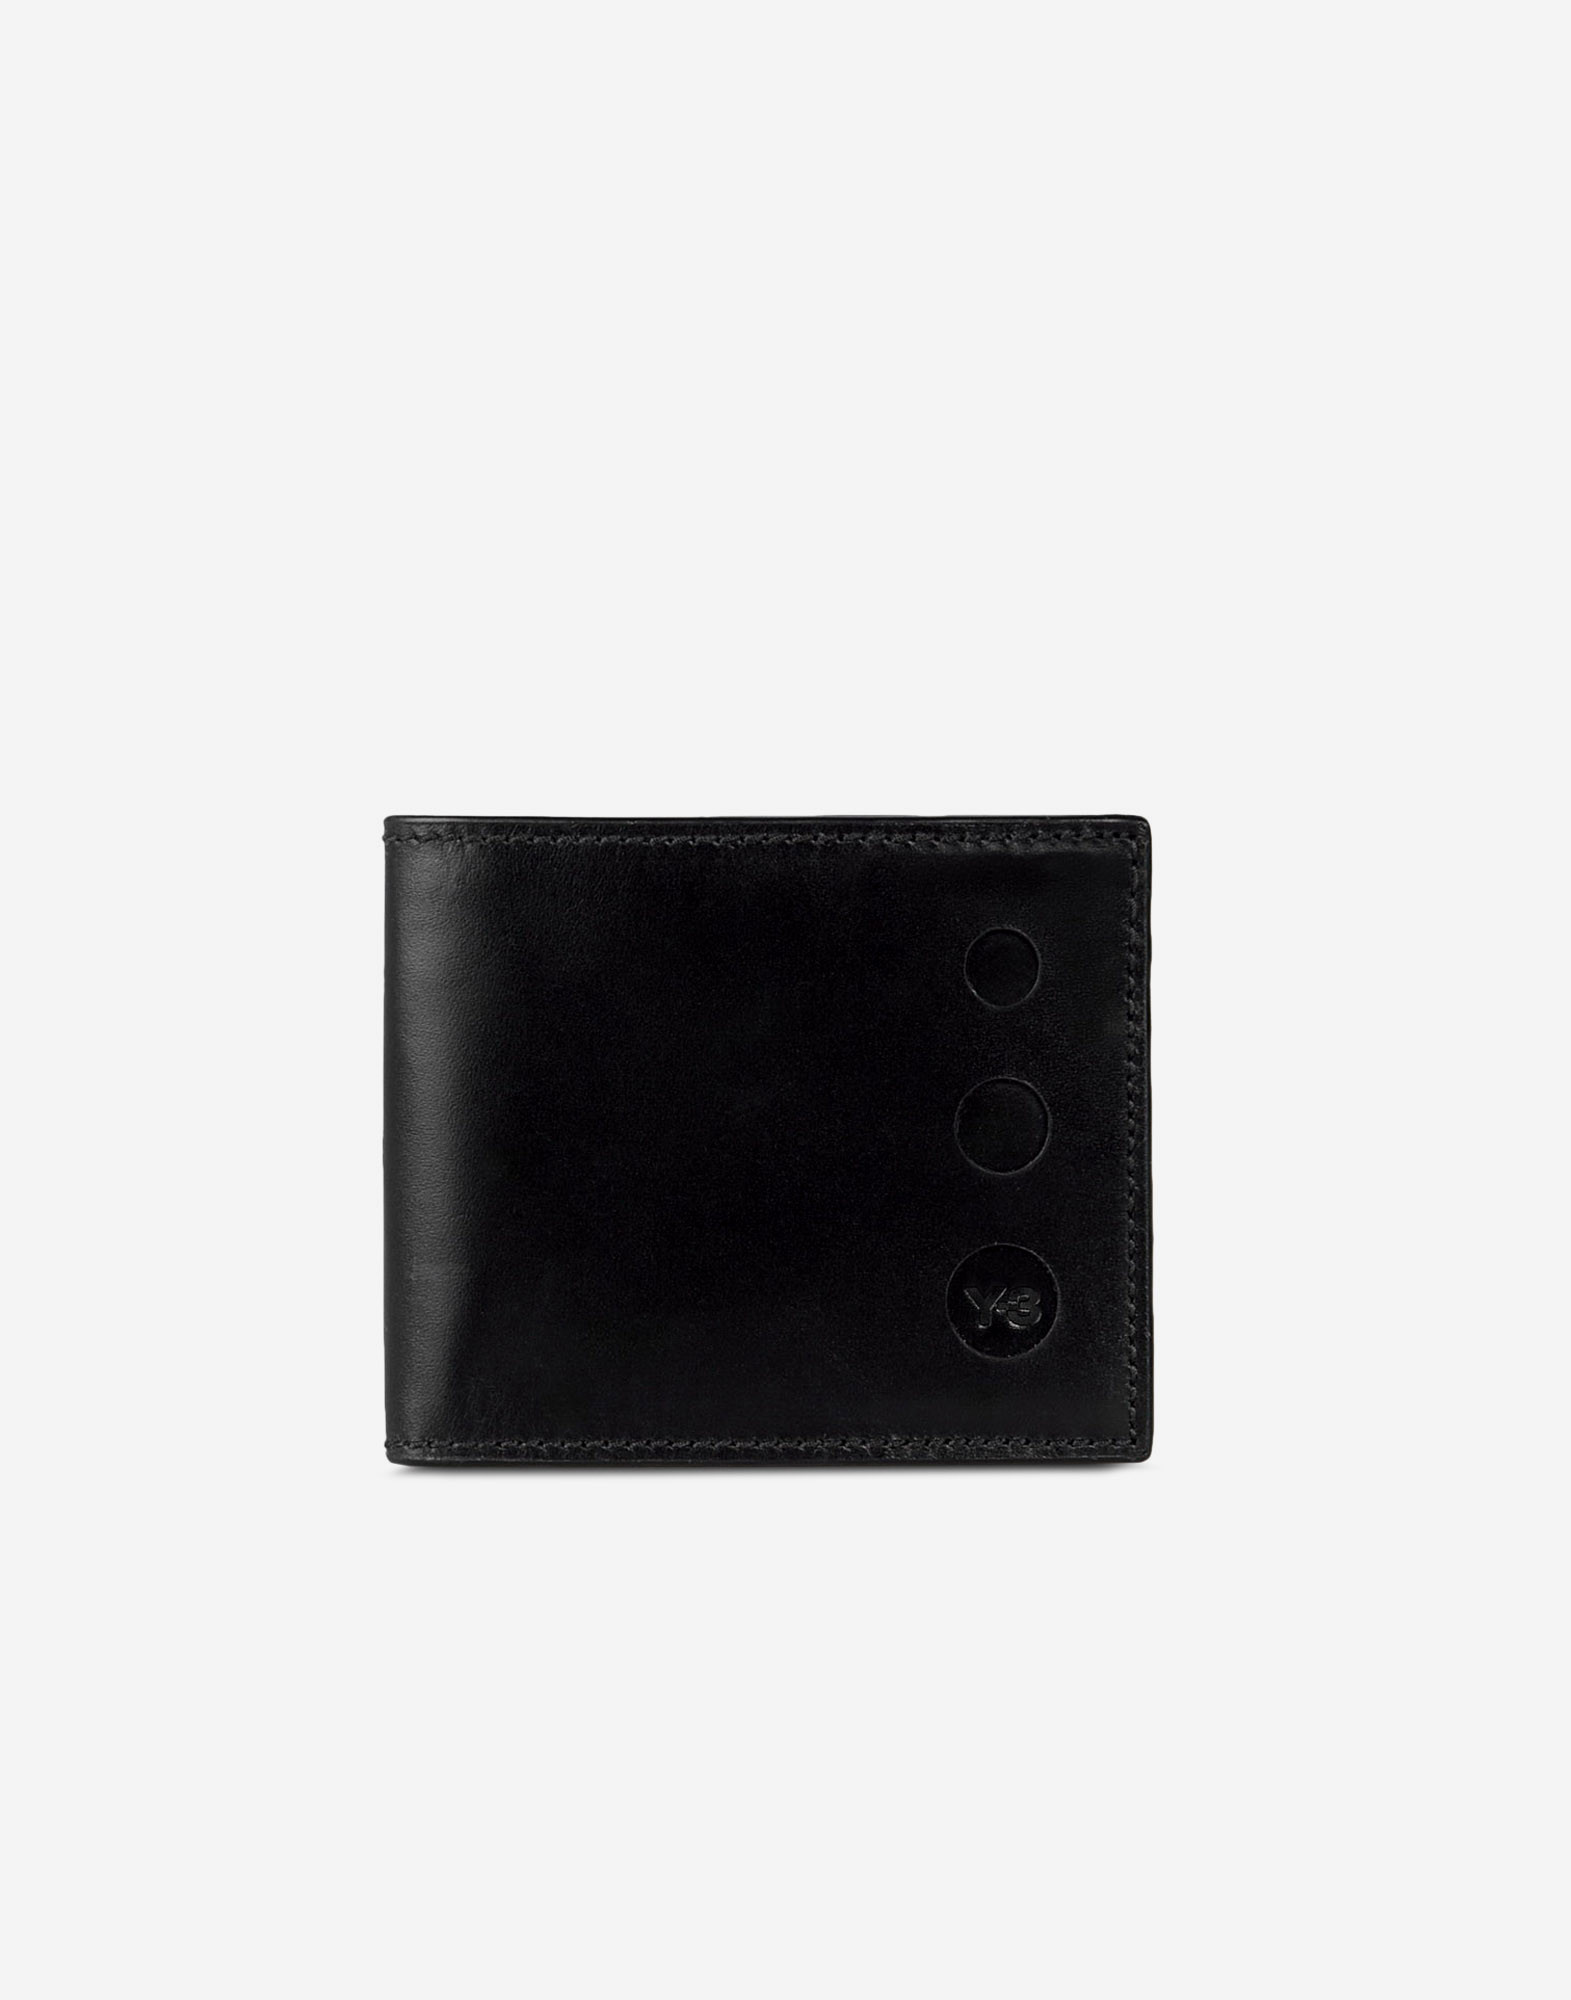 adidas portafoglio uomo